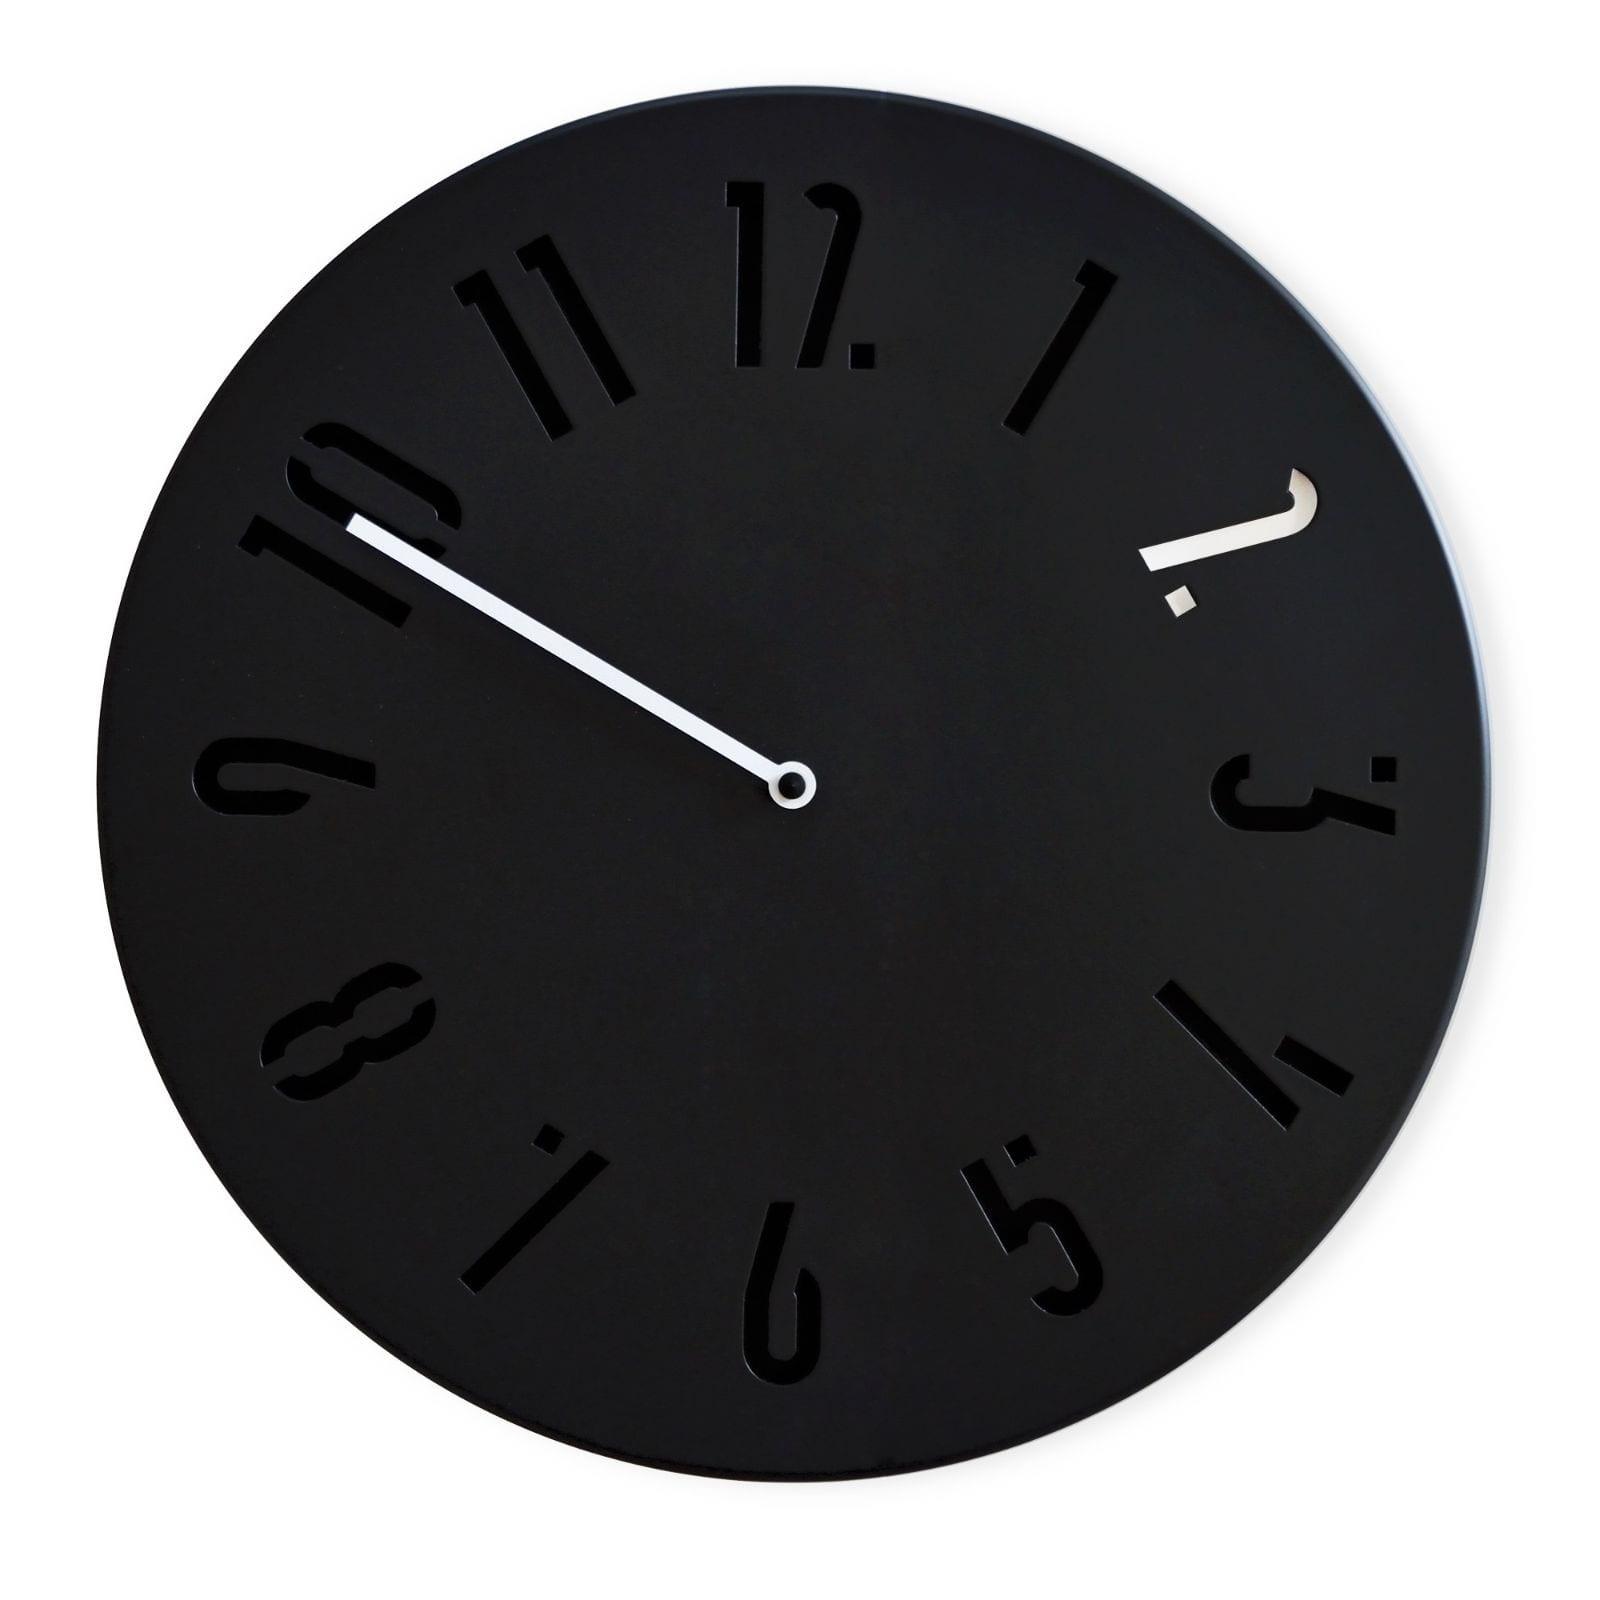 Mi Wall Clock (Black / White) - Sabrina Fossi Design